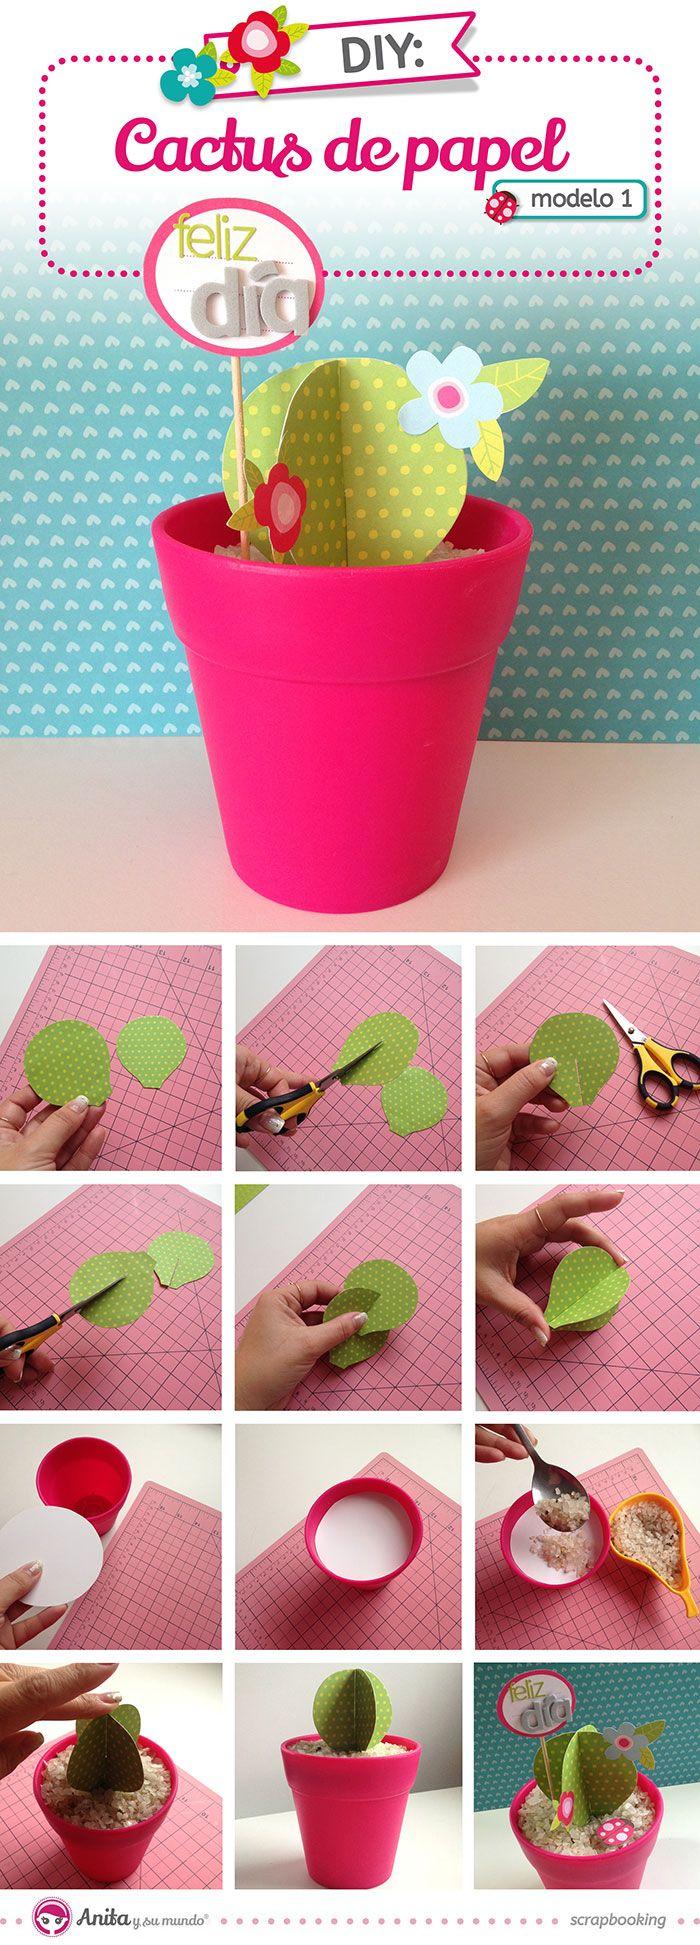 M s de 25 ideas fant sticas sobre flores de origami en - Todo tipo de manualidades para hacer ...